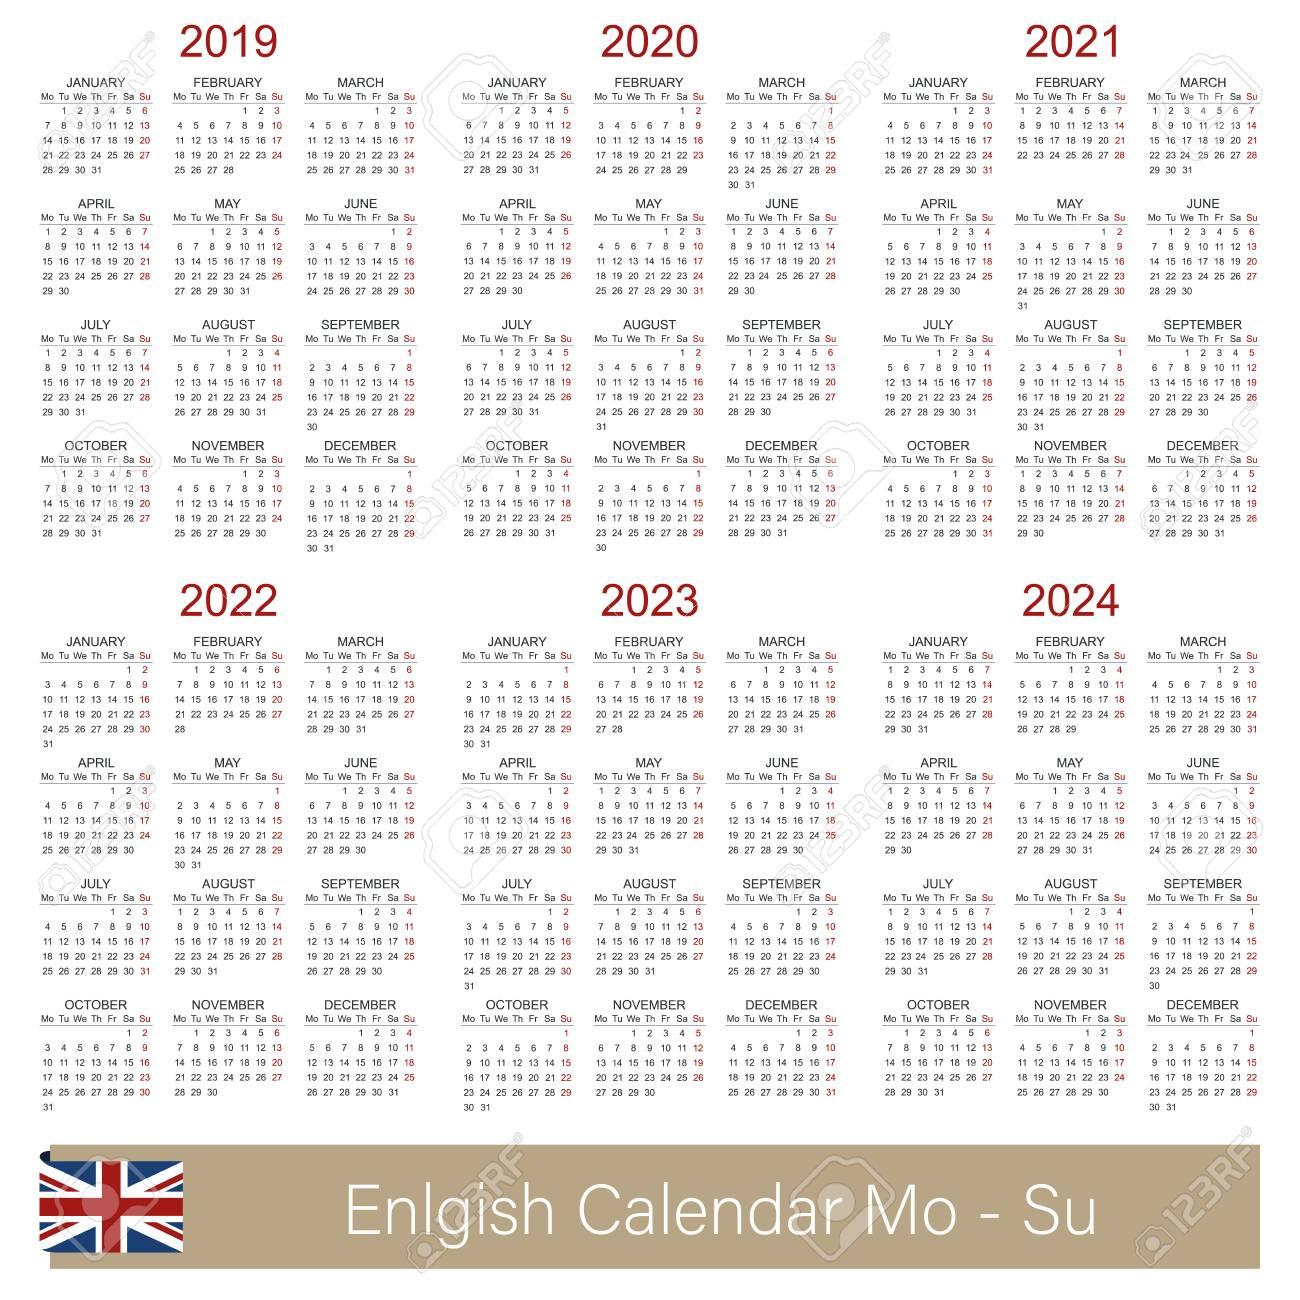 English Calendar 2019 - 2024, Week Starts On Monday, Simple Calendar..